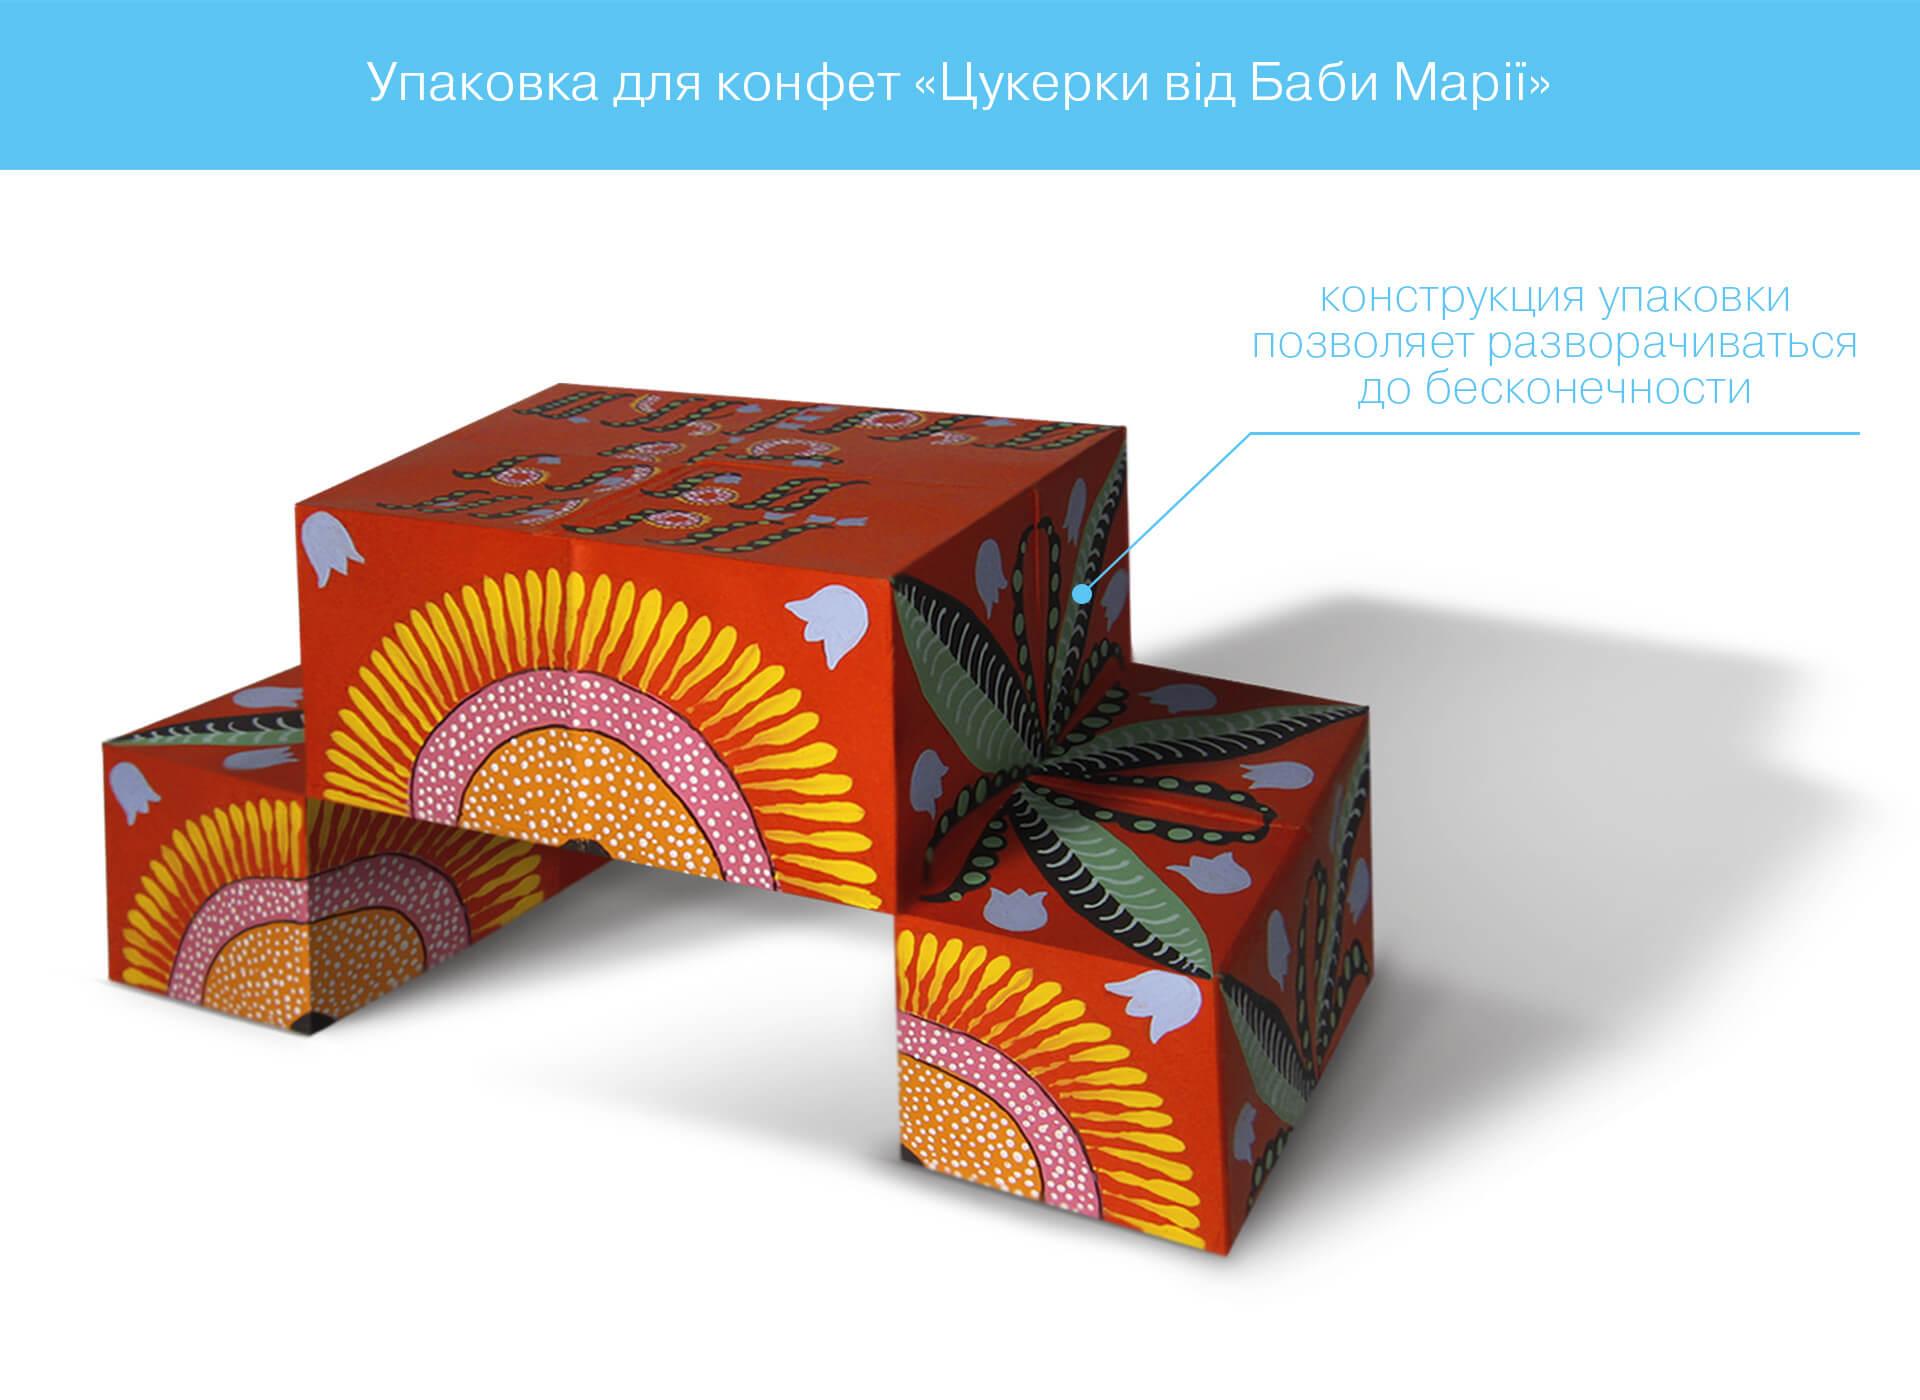 Prokochuk_Irina_Packing Tsukerki od Babi Marії_2